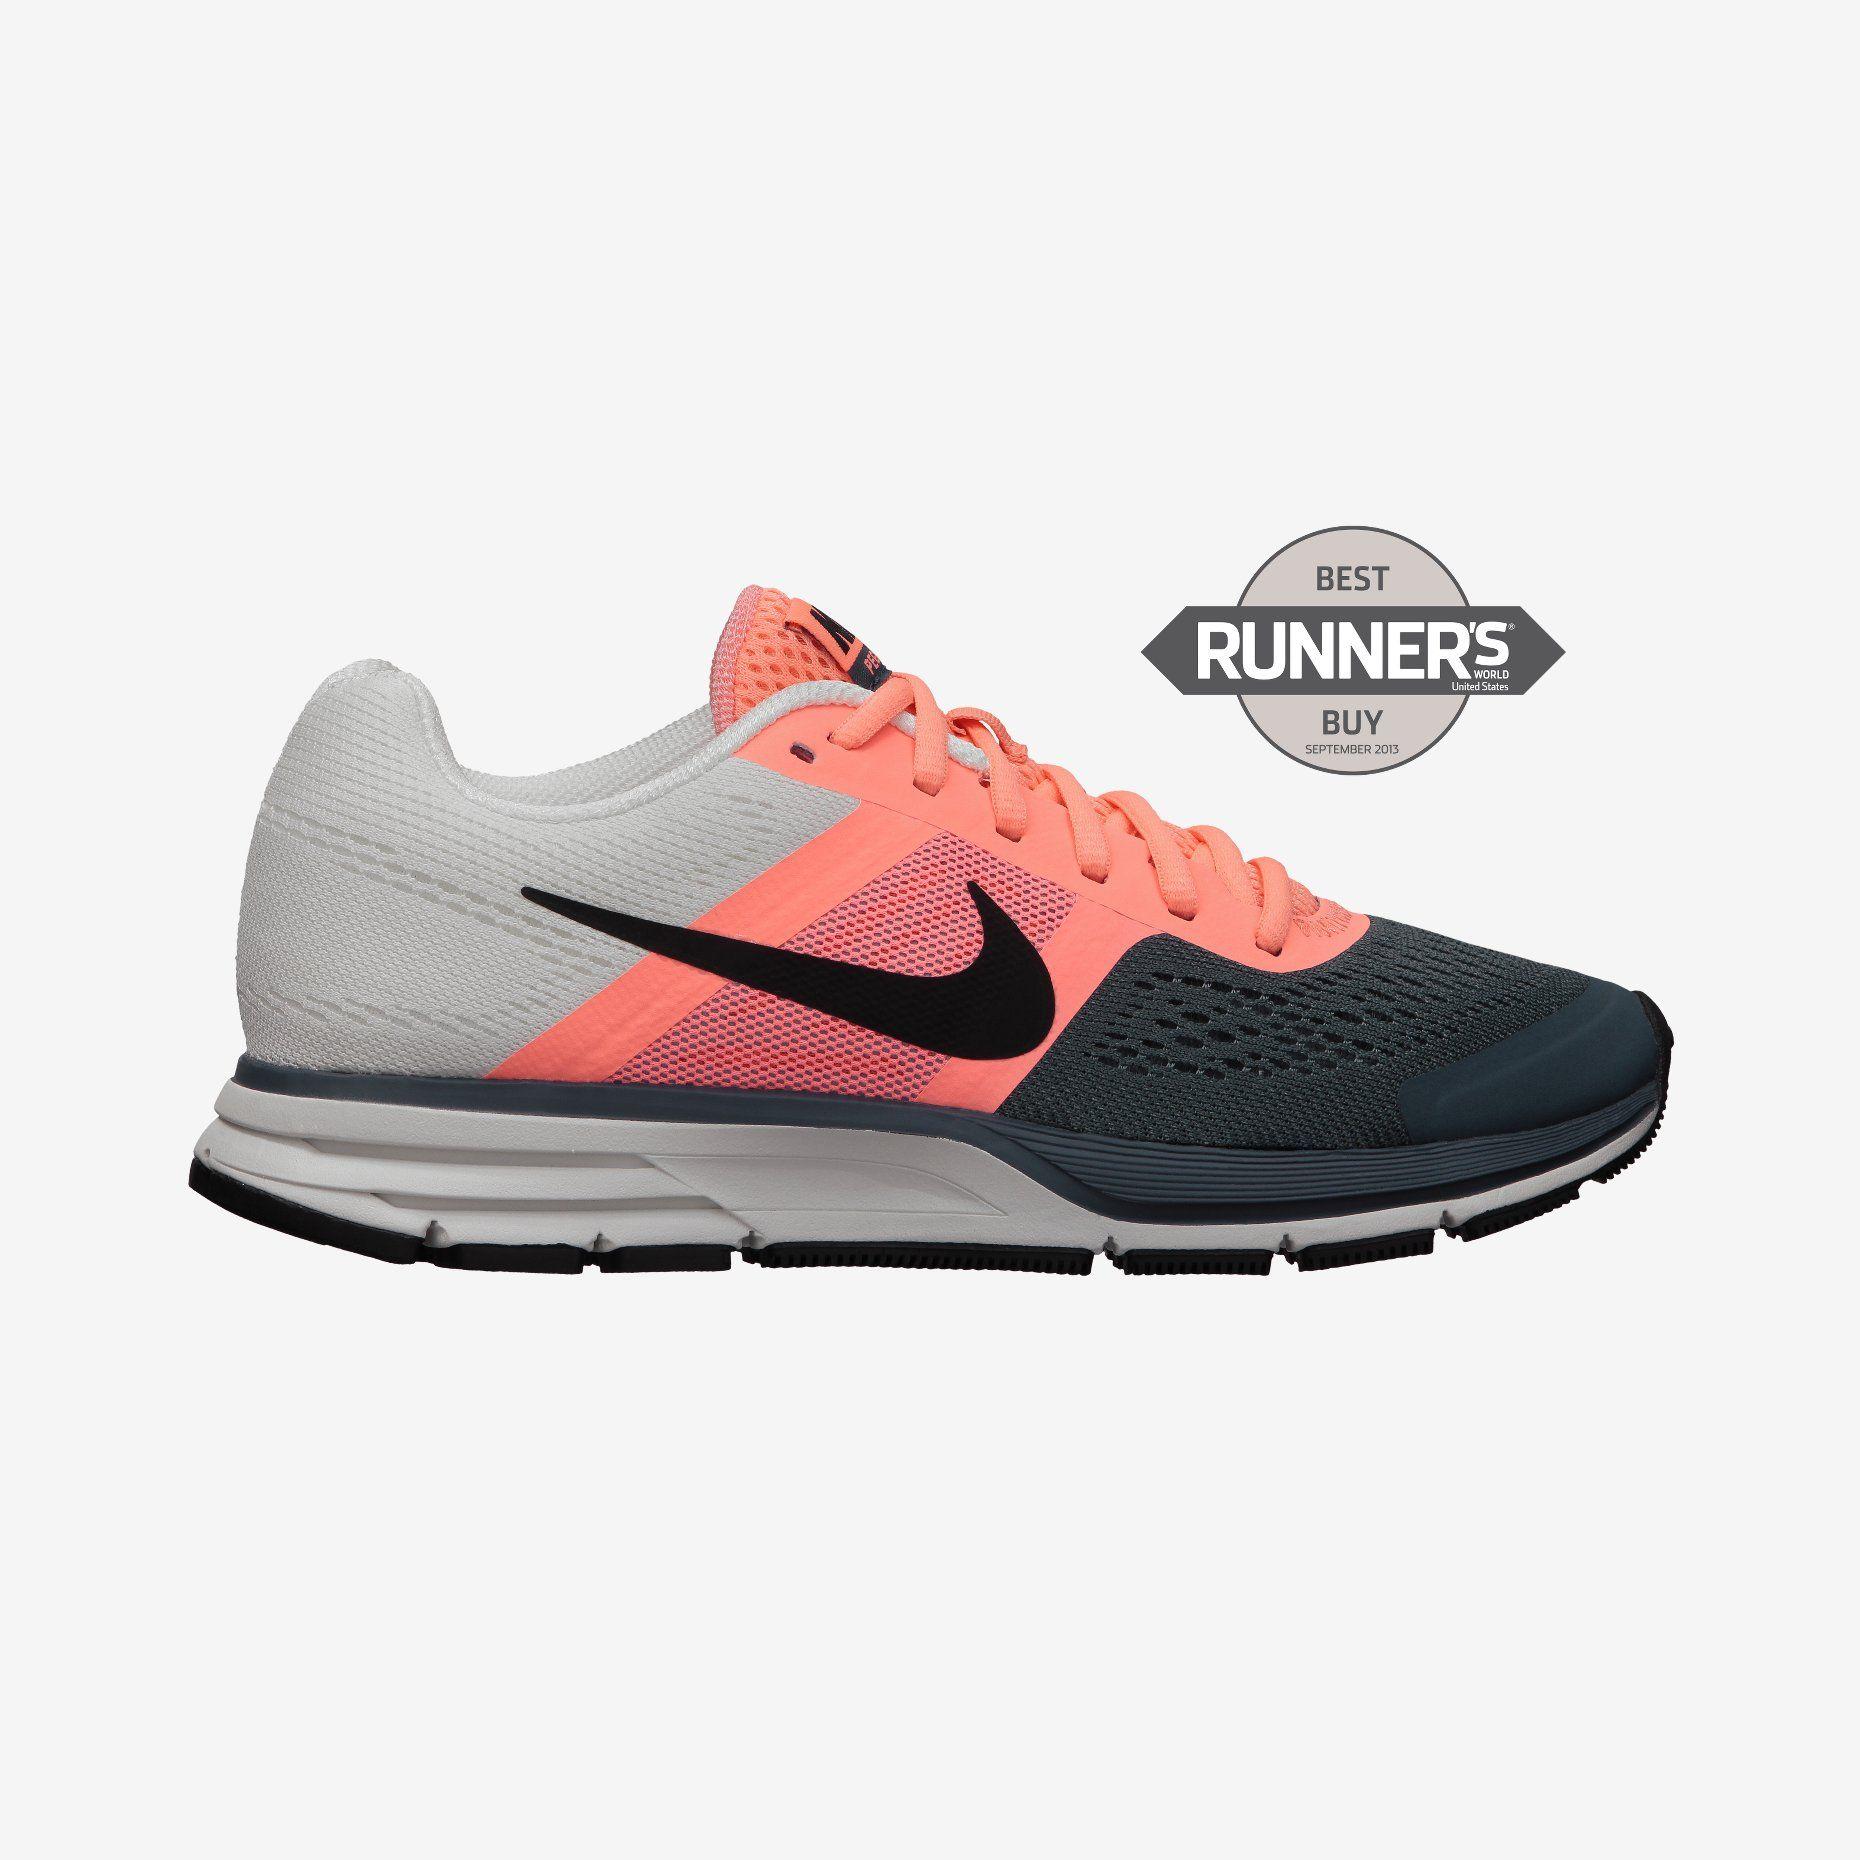 NederlandAir Pegasus 30 Shoe Women's Nike Store Running 7Y6fbgy